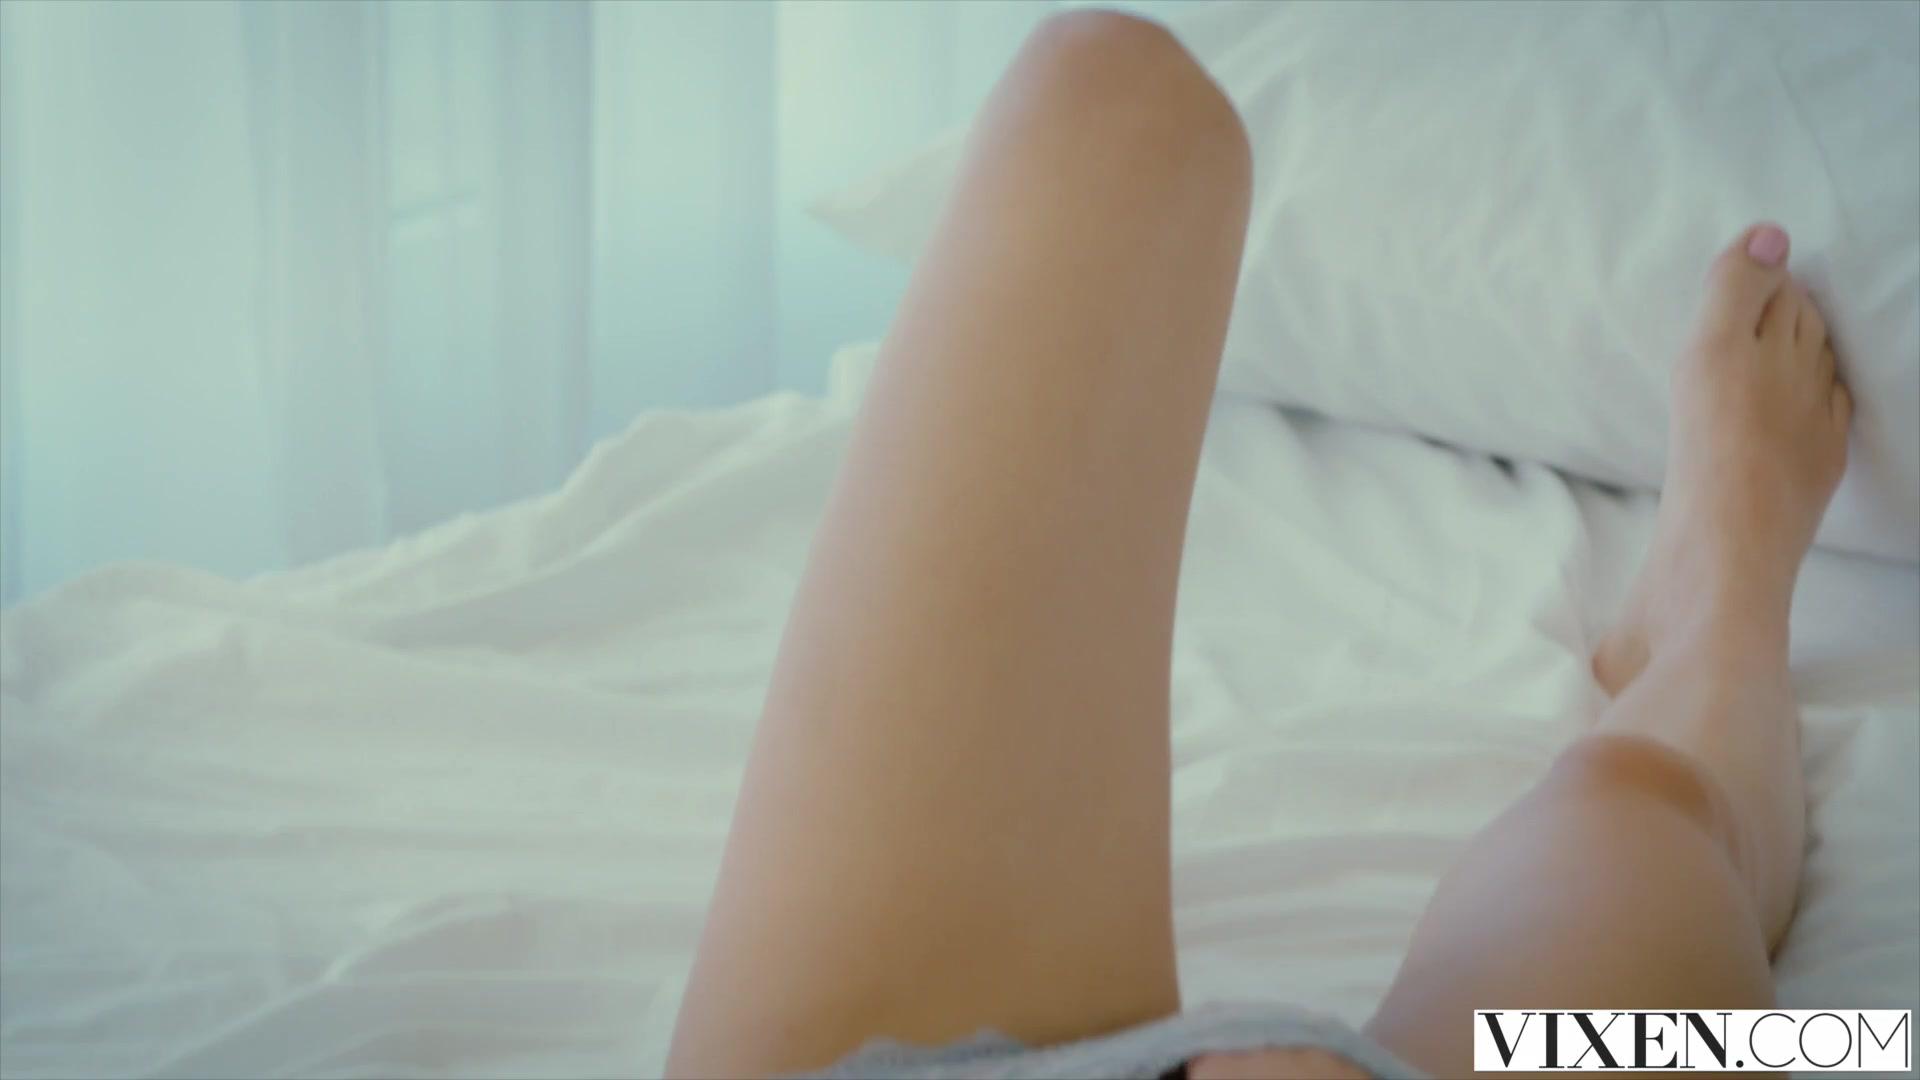 Pornex fuckk videos Lesbiane